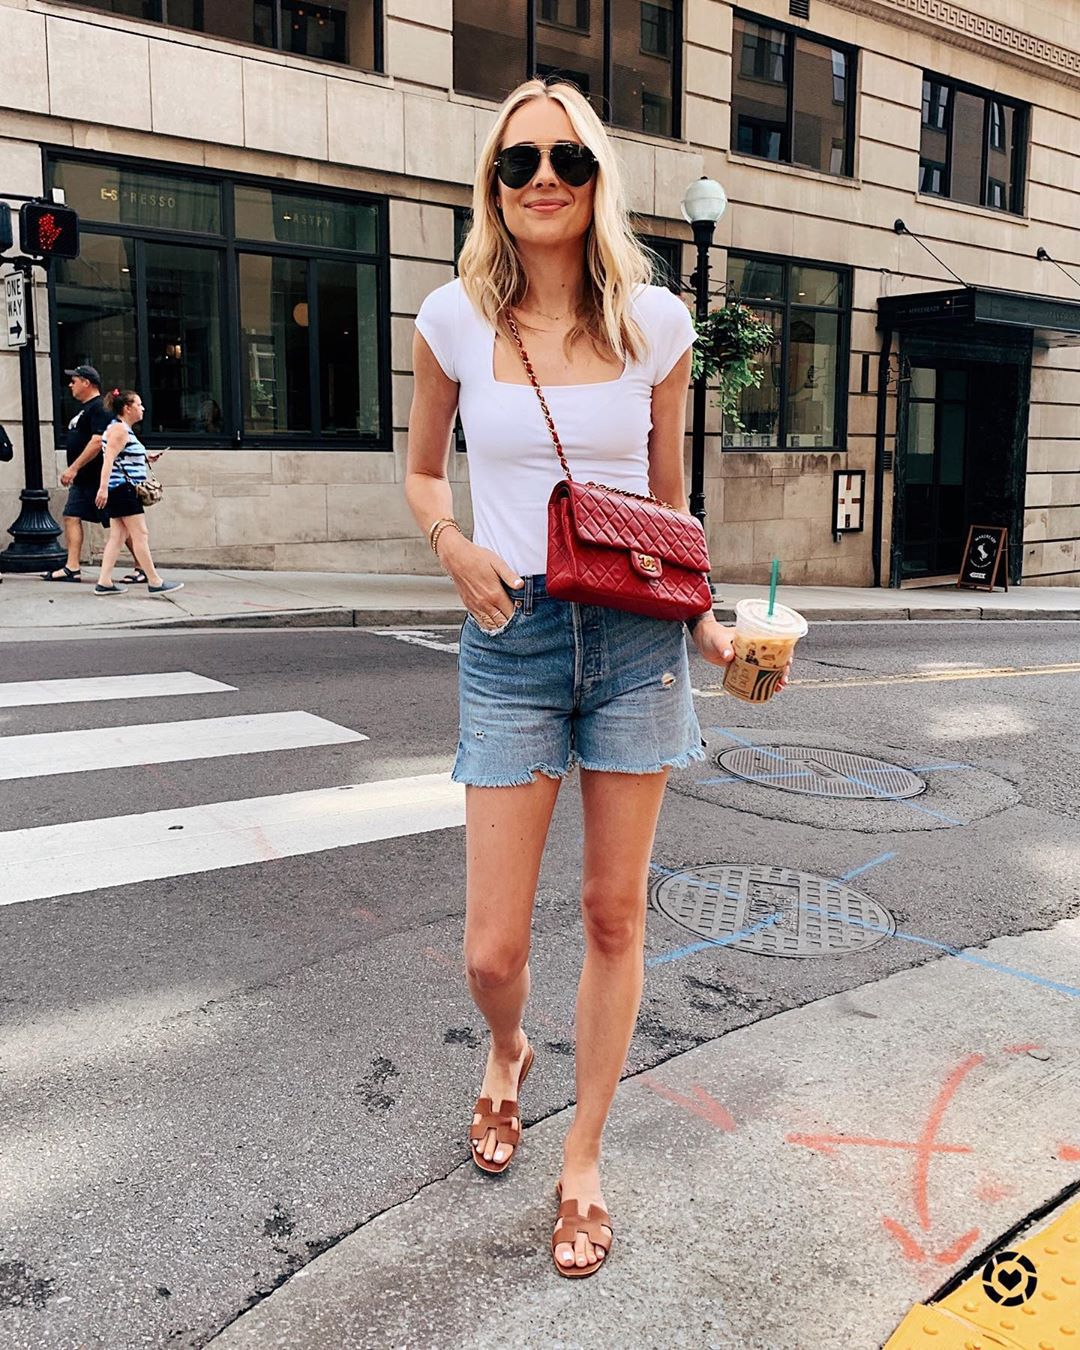 underwear bodysuit denim shorts slide shoes red bag